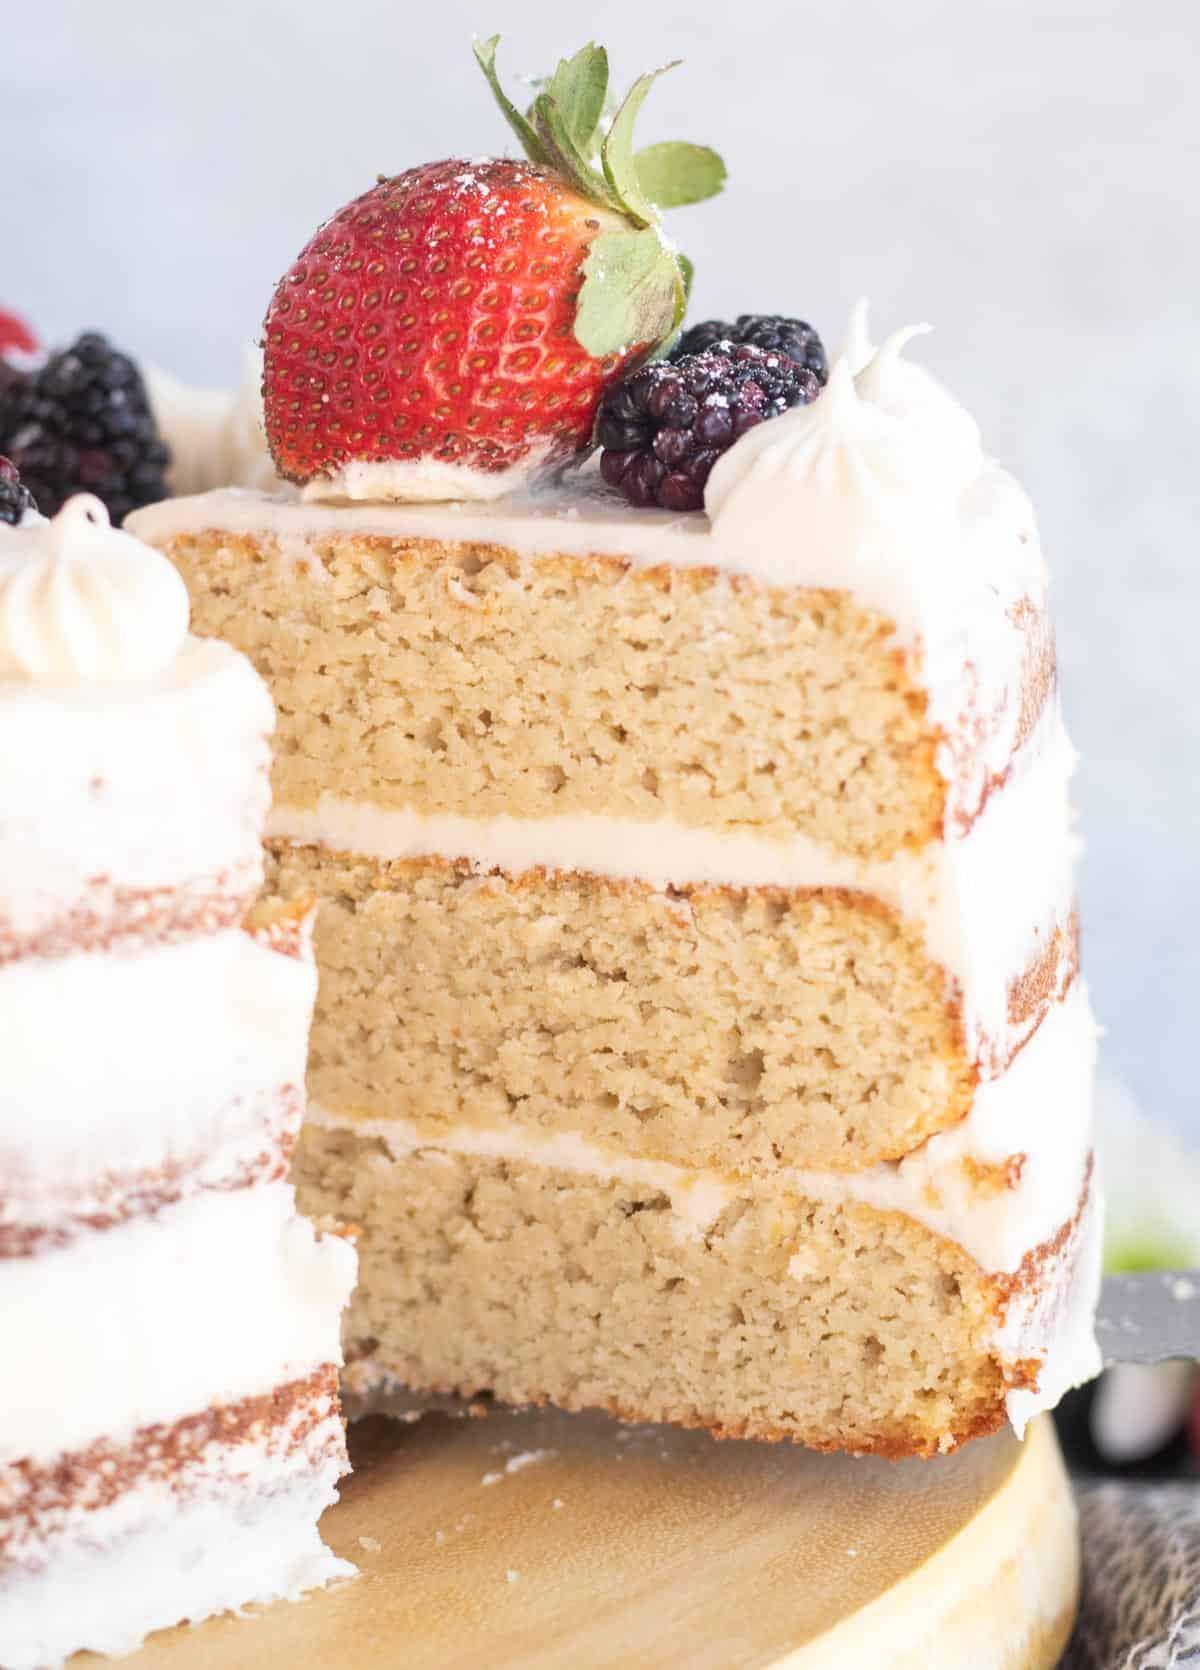 Slice of Keto Vanilla Cake On White Plate With Strawberries